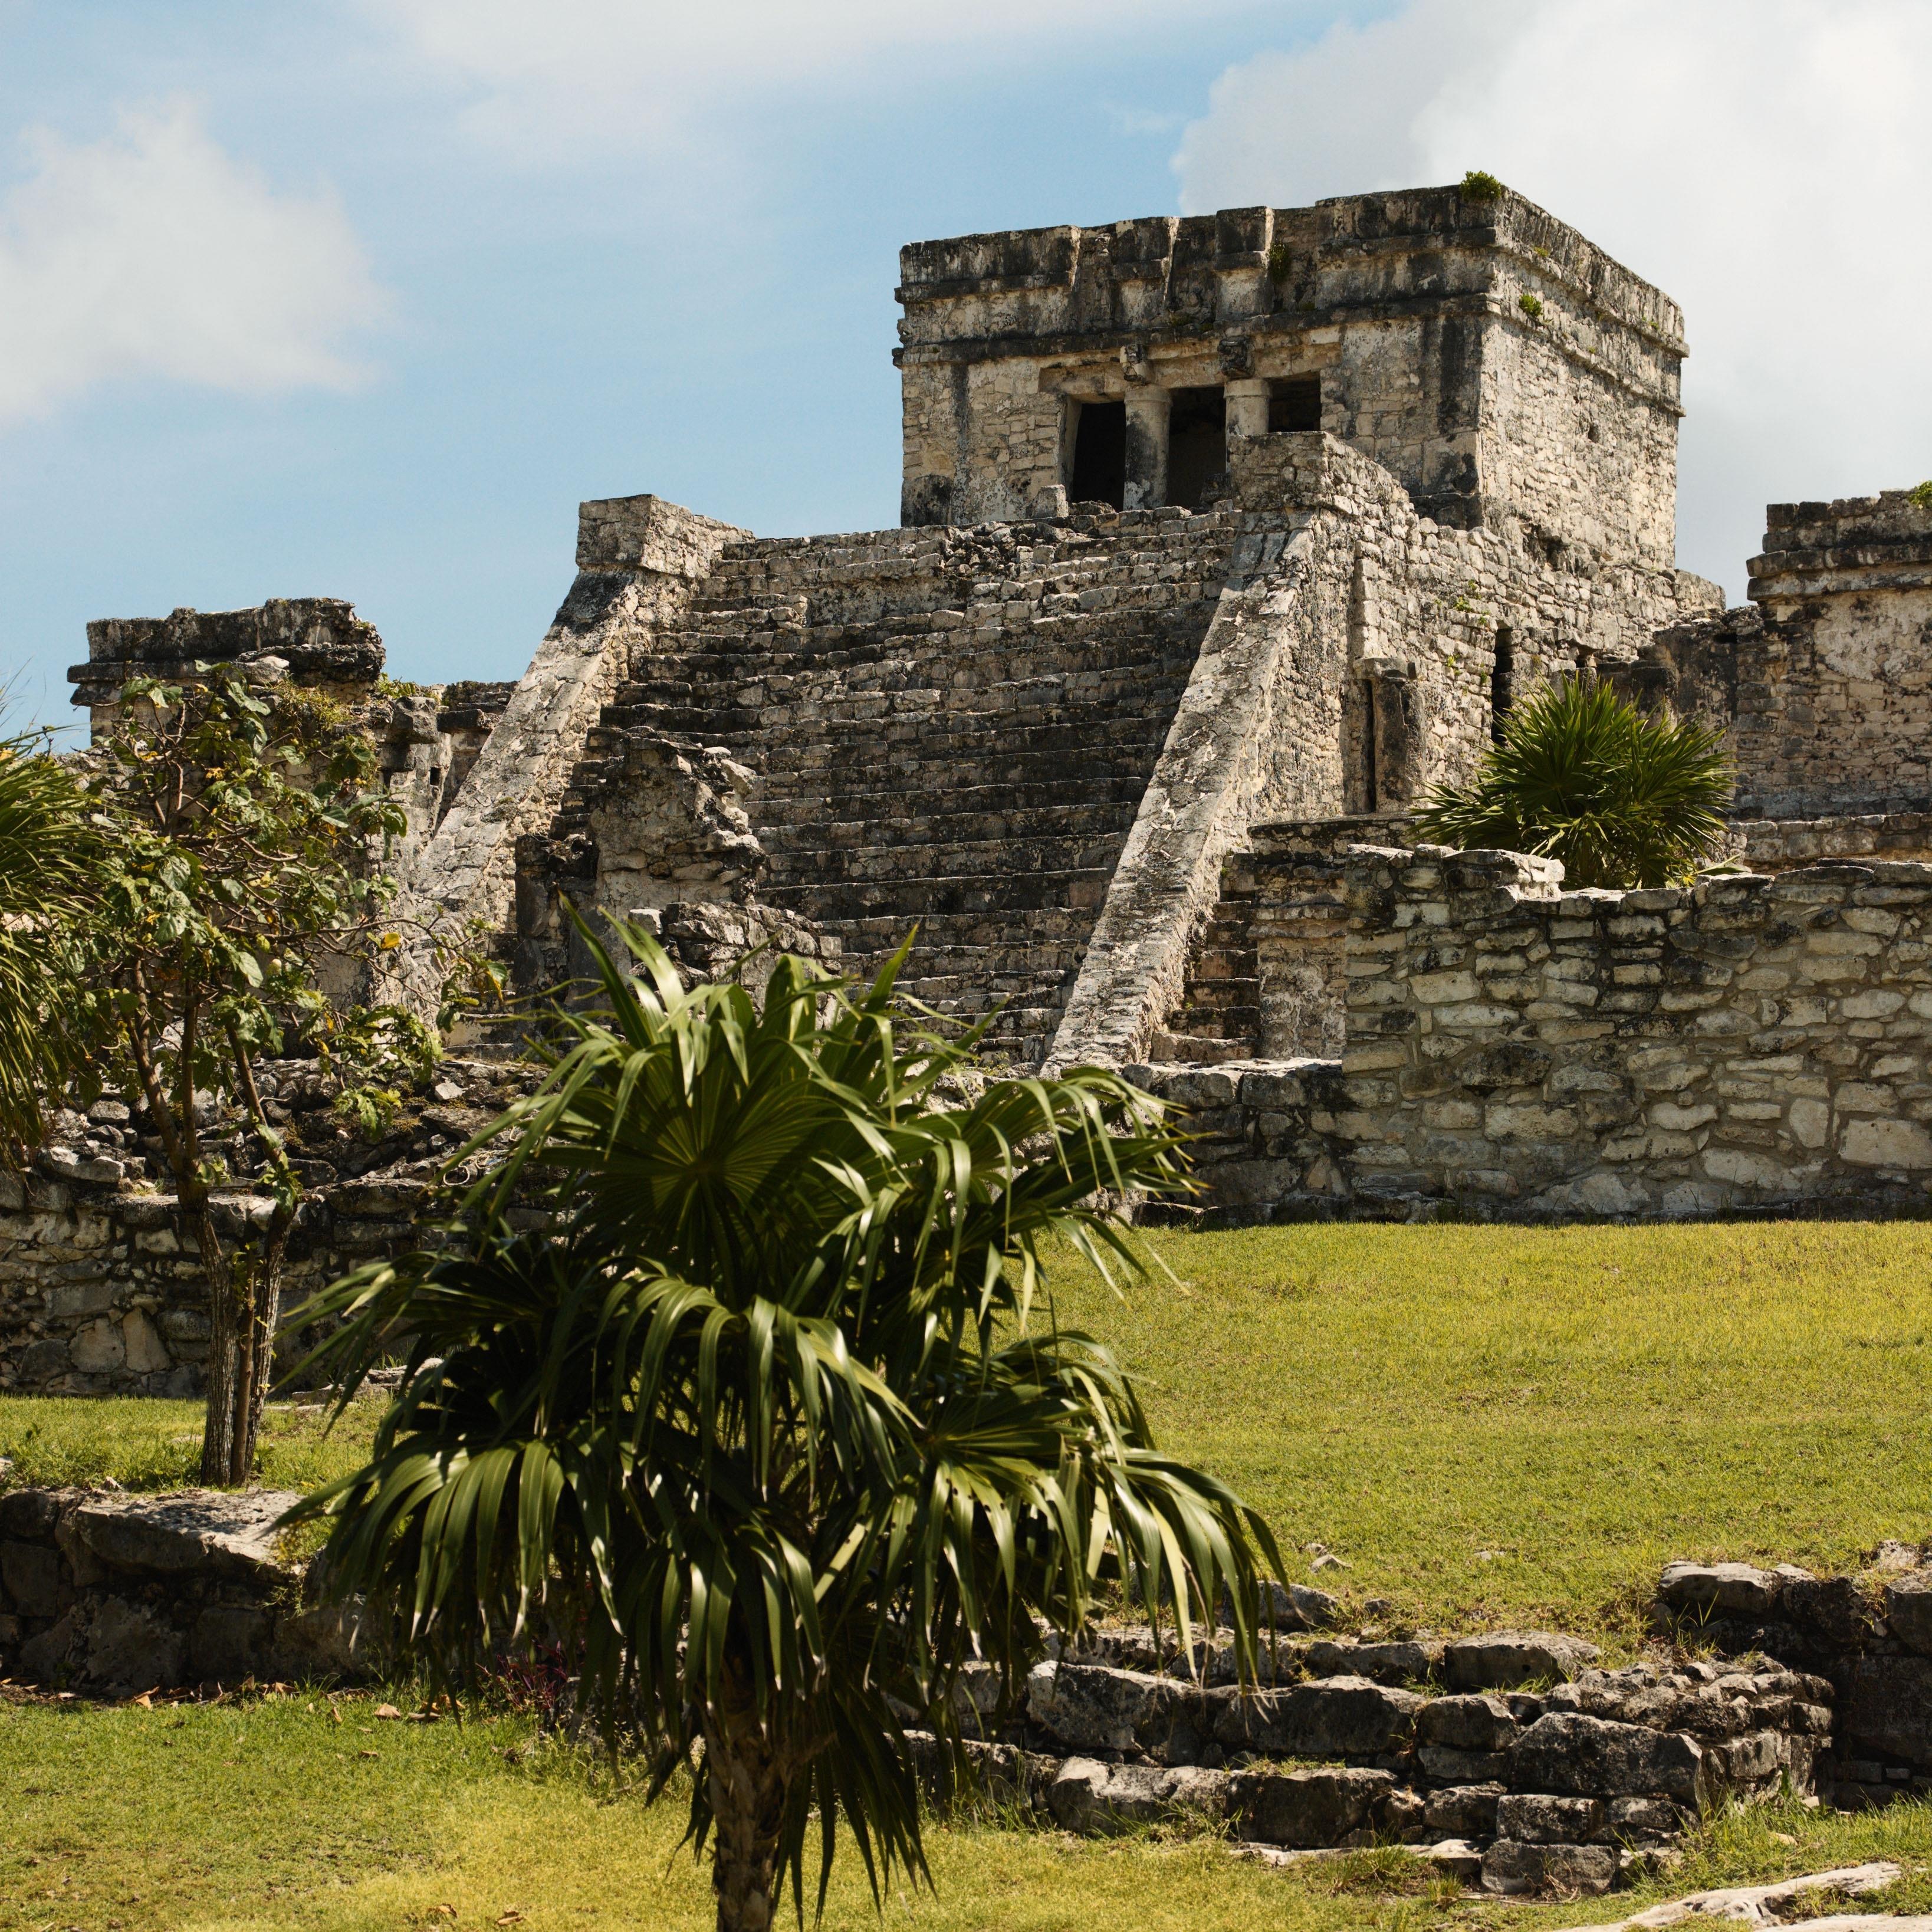 Temple of Doom, Tulum, Quintana Roo, Mexico